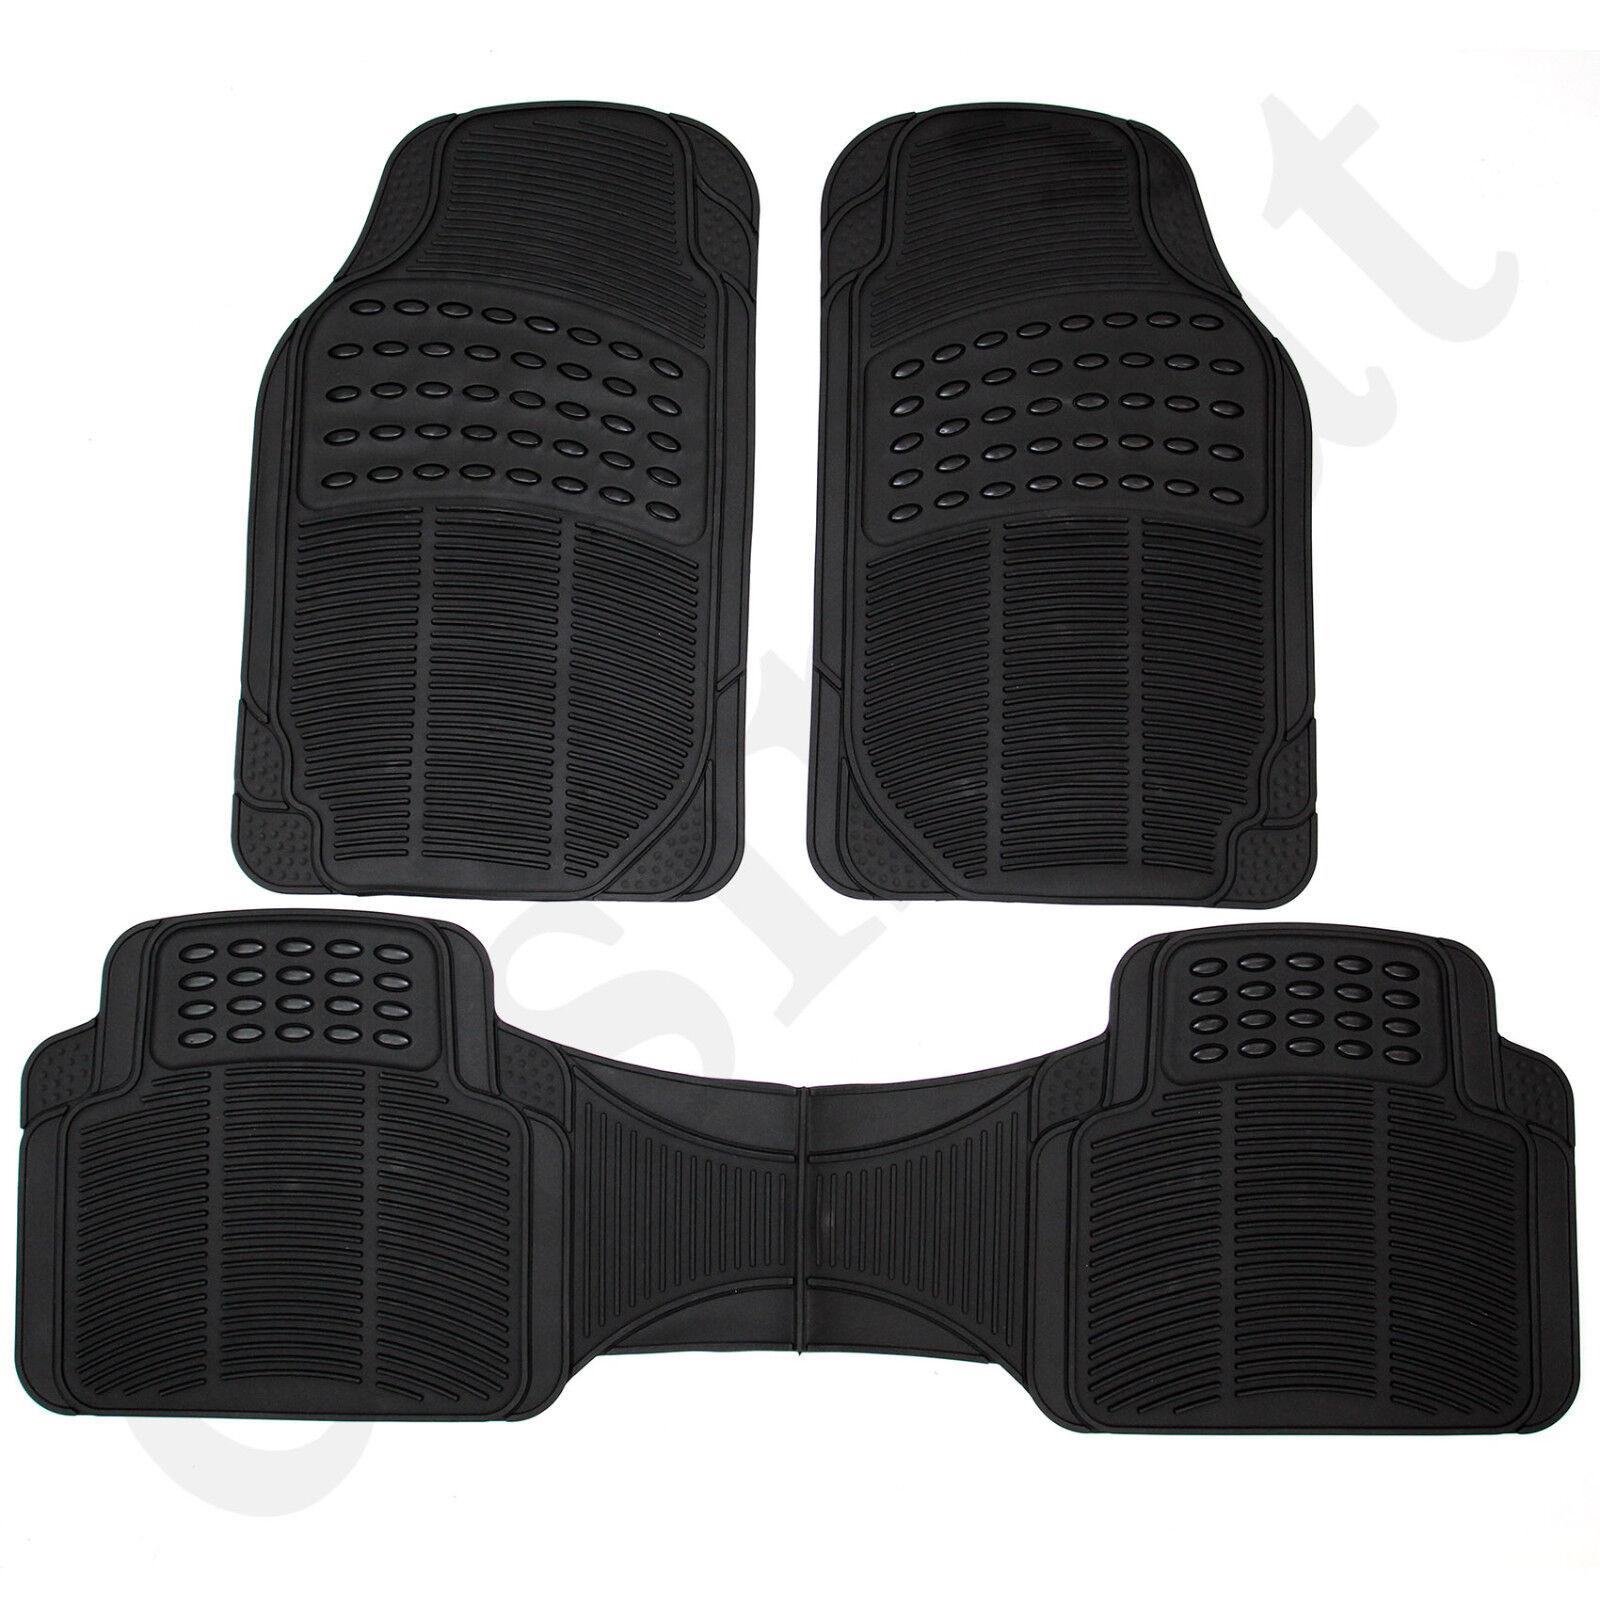 Car Parts - Universal Car Van Mats Heavy Duty Rubber Floor Mat Set Black Non Slip 3pc